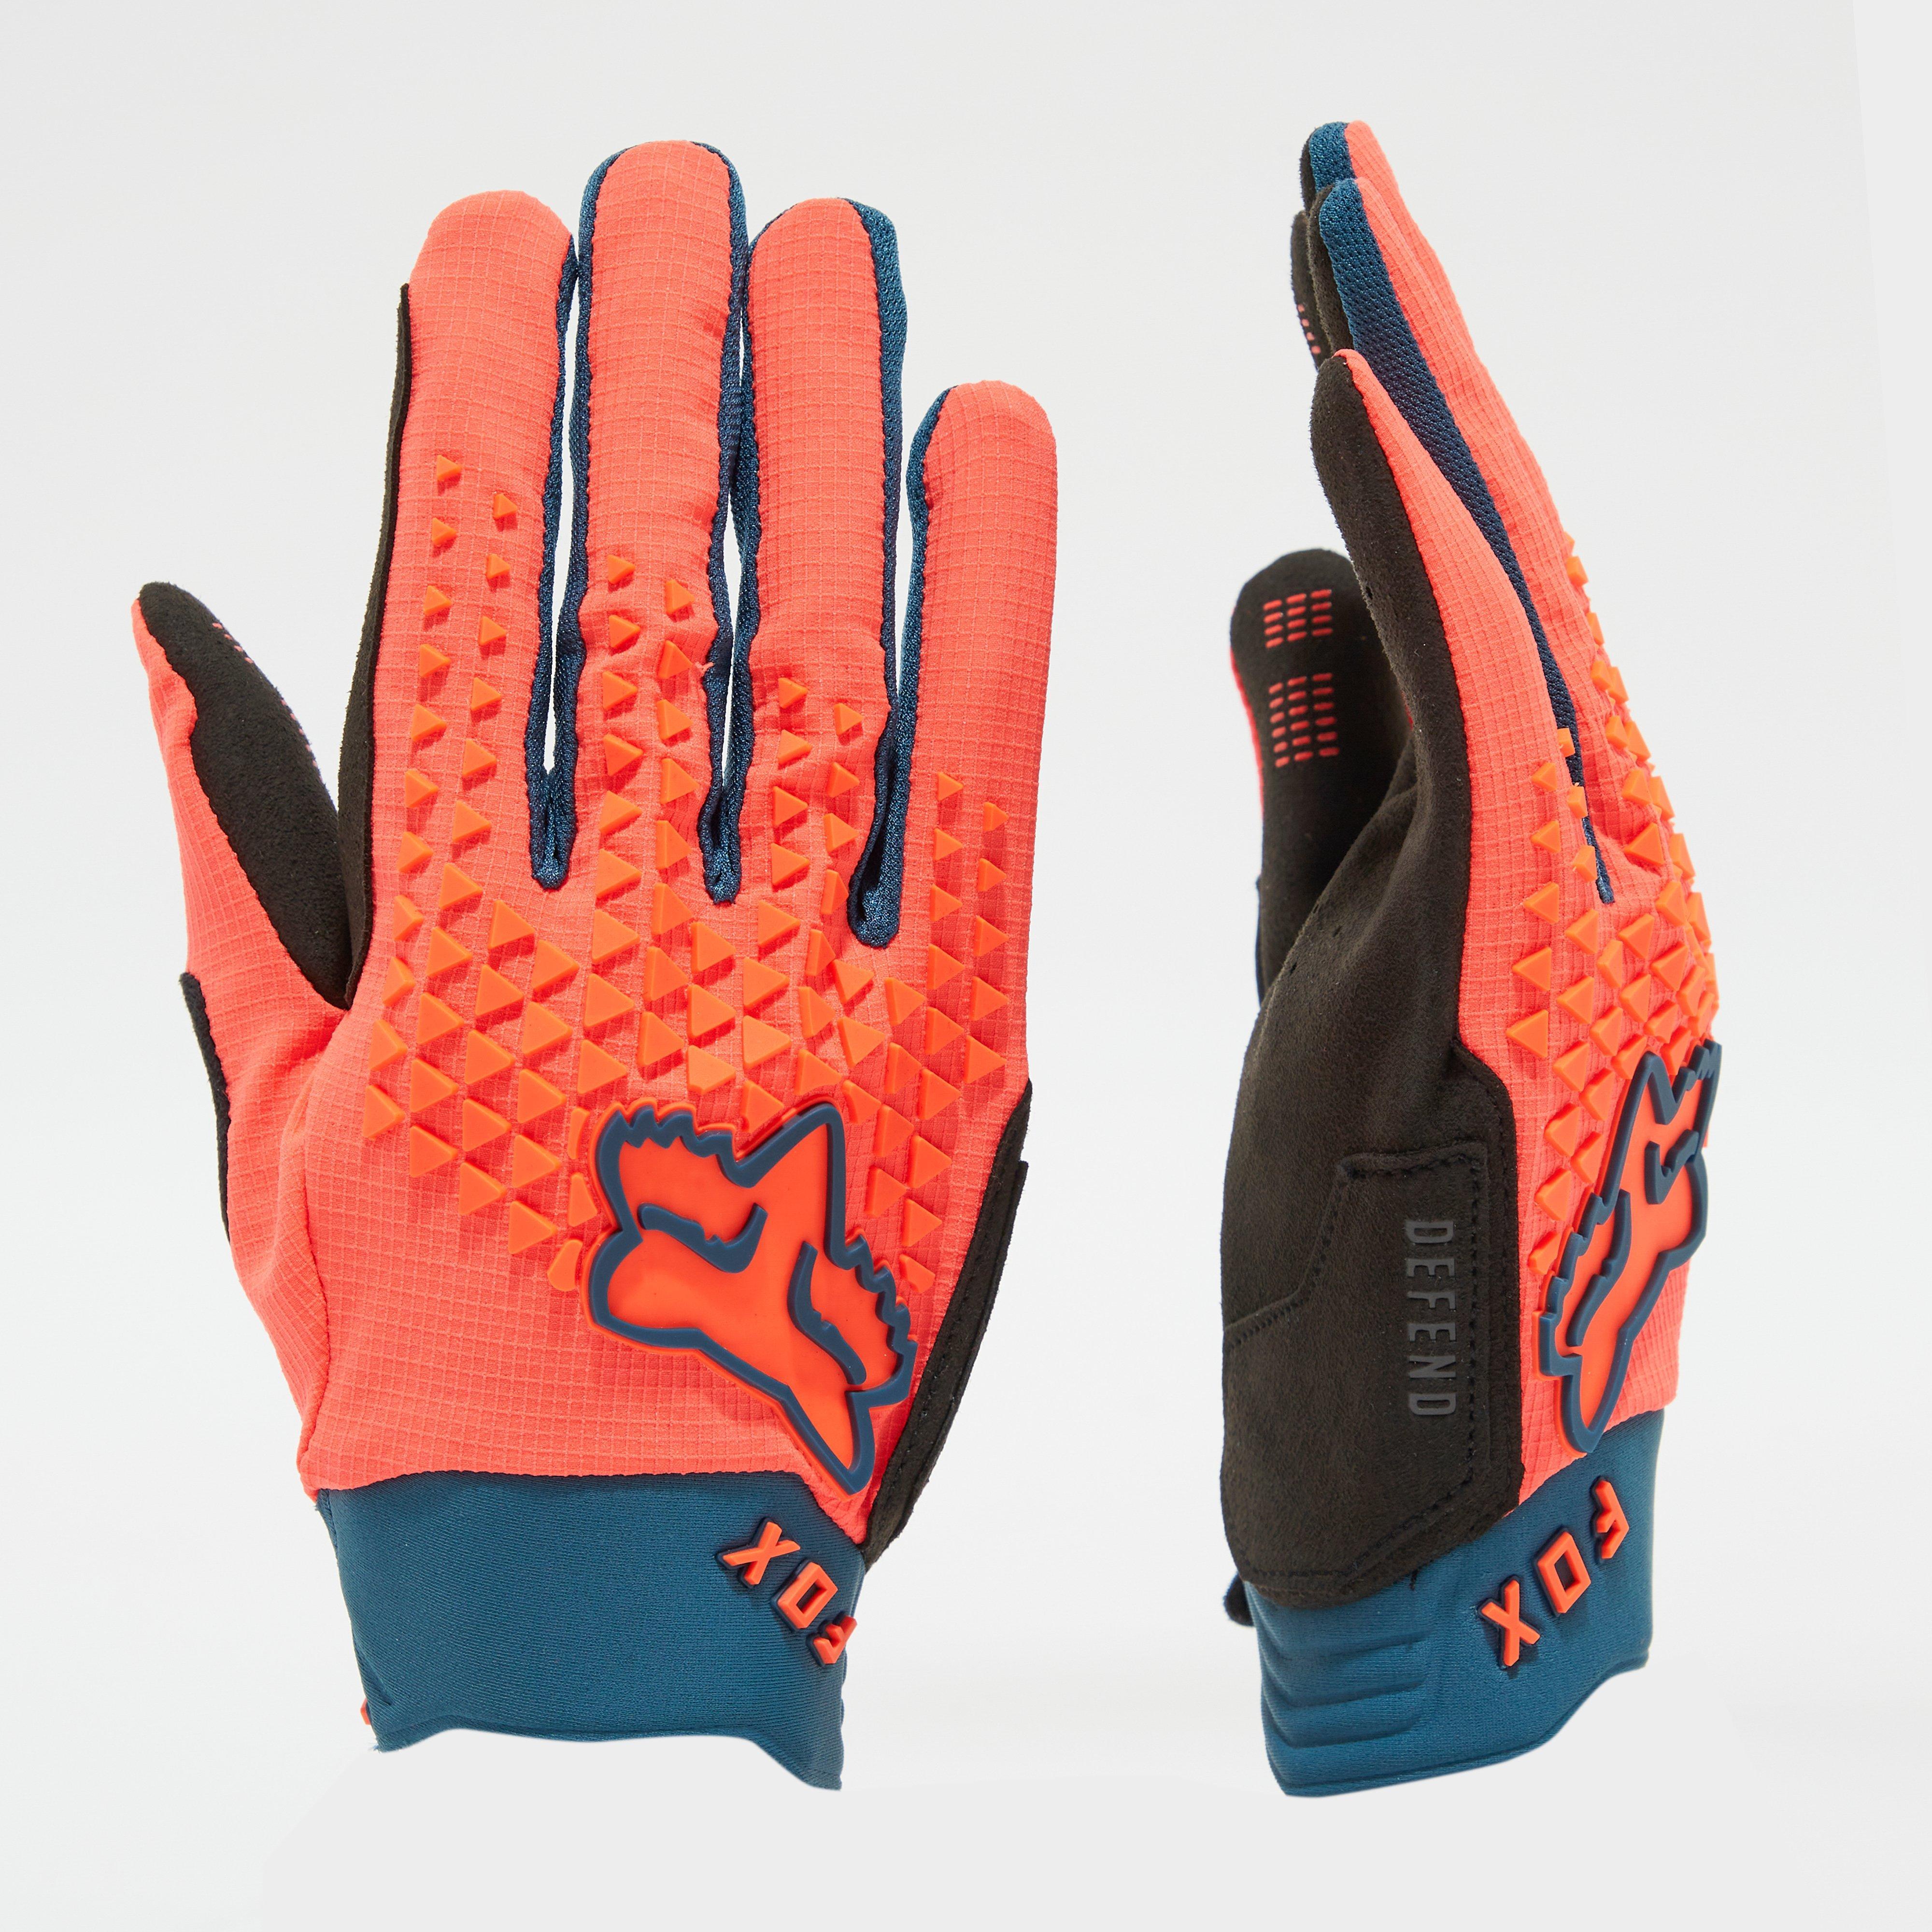 Fox Men's Defend Gloves - Orange/Blue, Orange/Blue